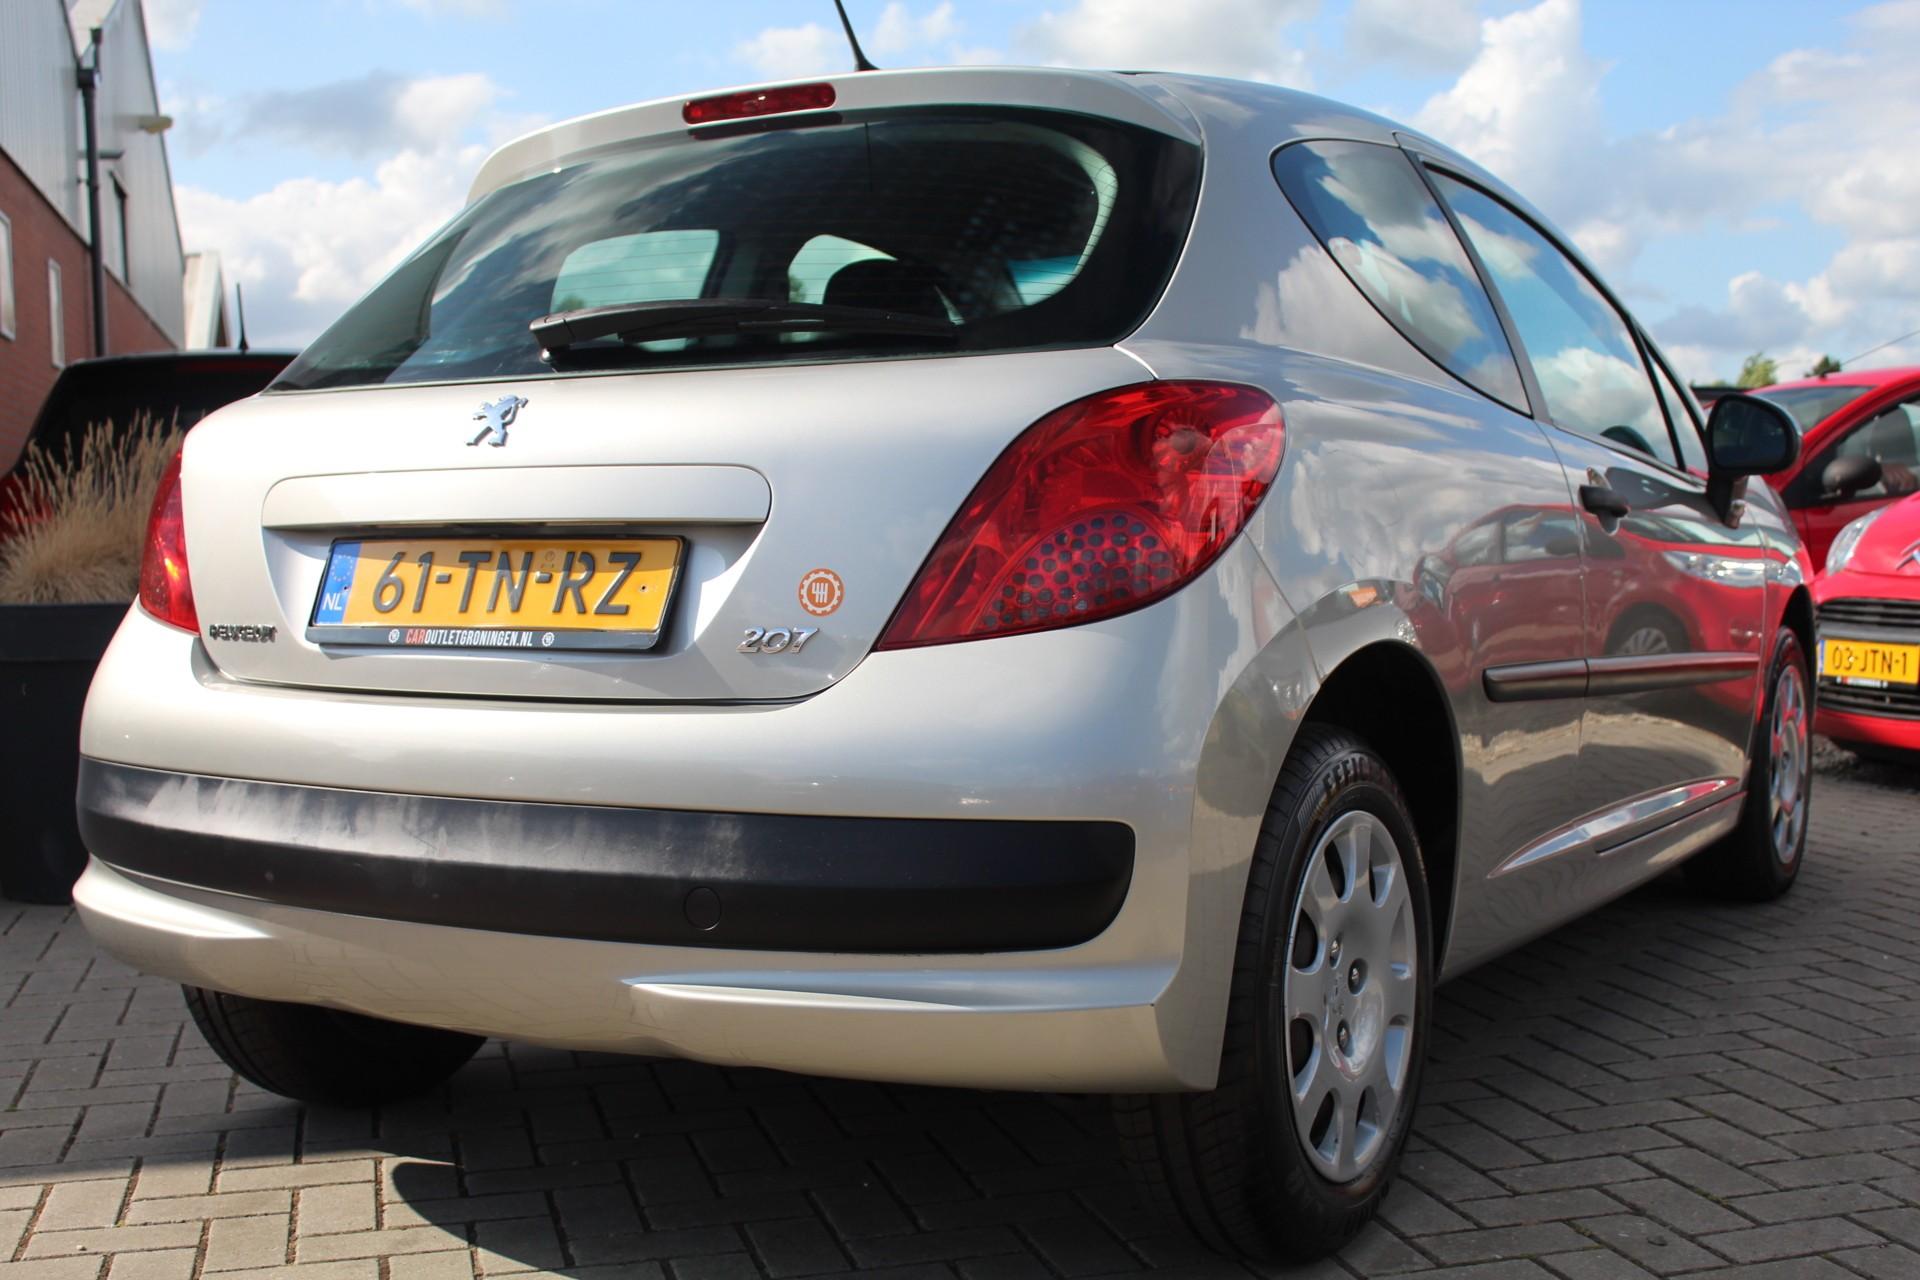 Caroutlet Groningen - Peugeot 207 1.4 | AIRCO | ELEK PAKKET | NETTE AUTO